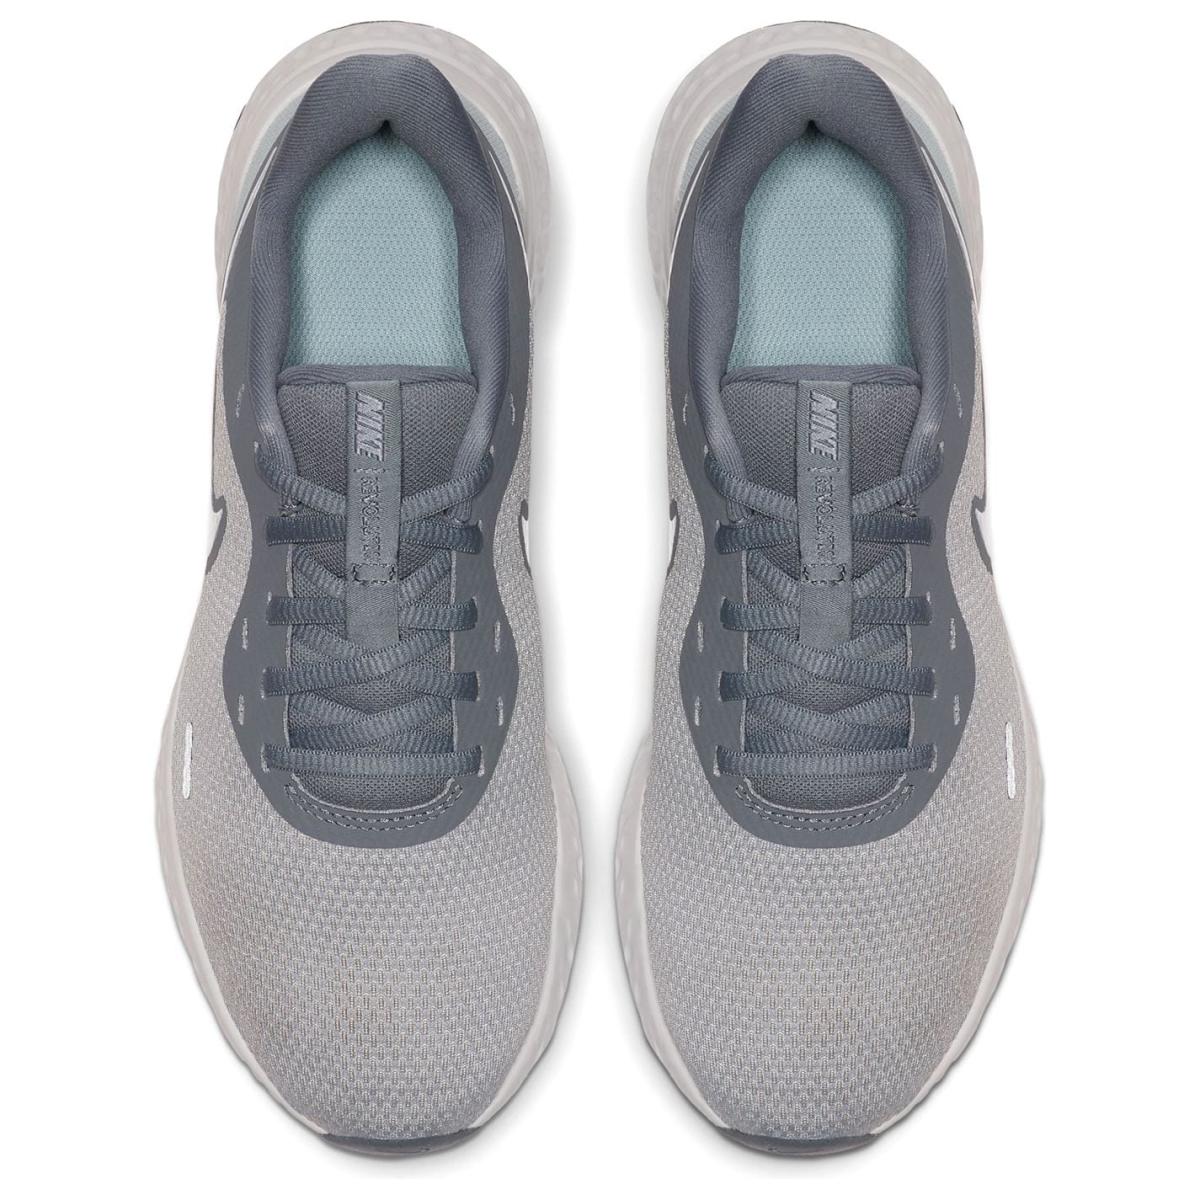 Nike-Revolution-Turnschuhe-Damen-Sneaker-Sportschuhe-Laufschuhe-1160 Indexbild 22